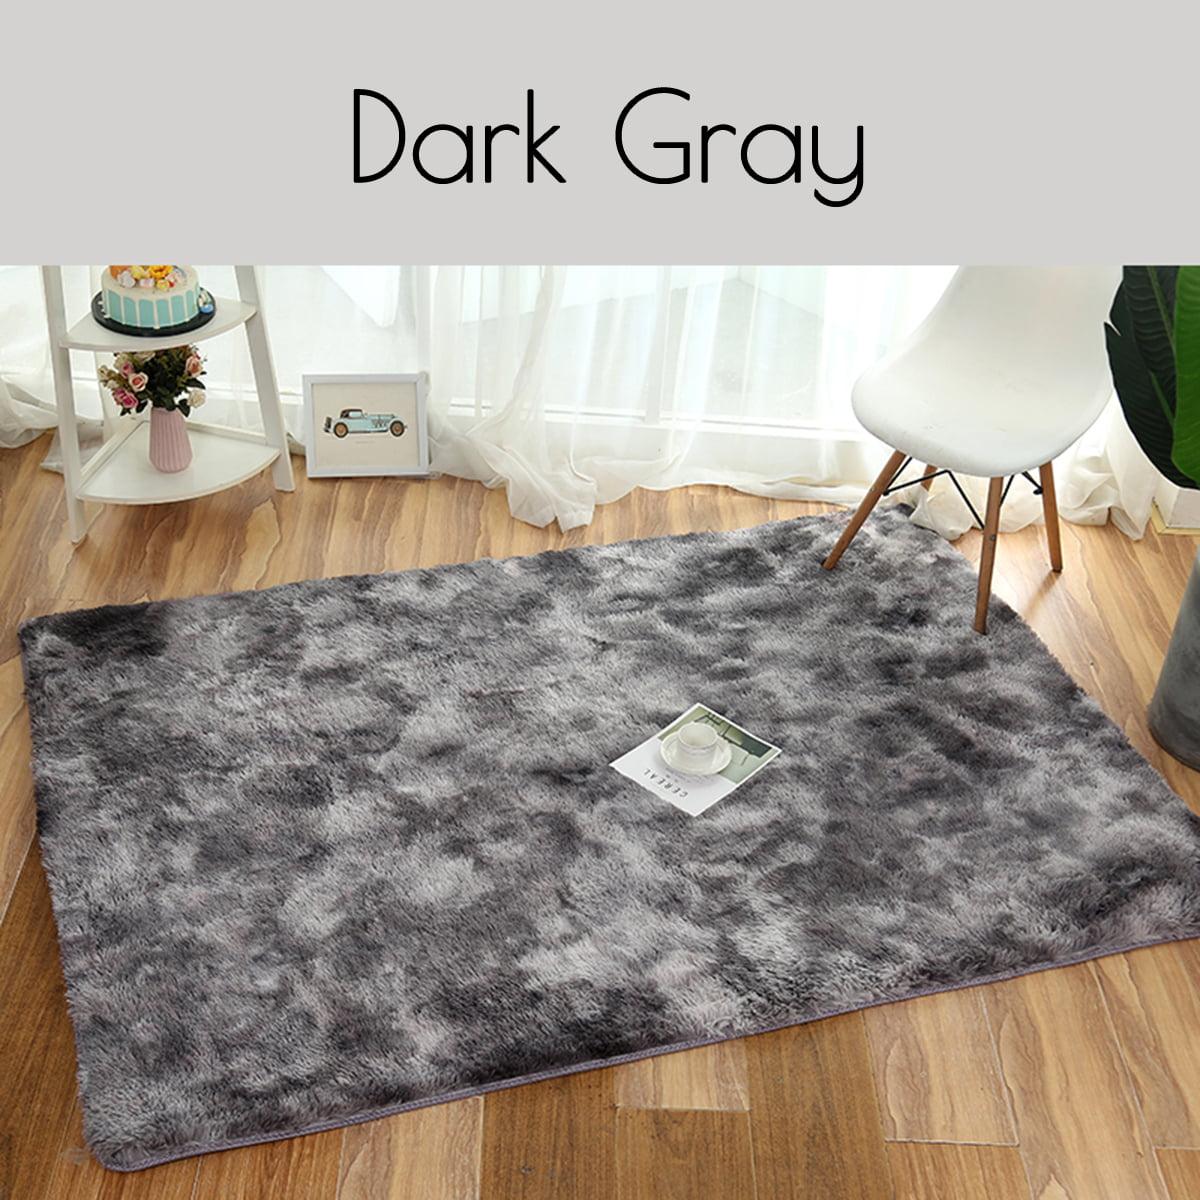 Soft Fluffy Rugs Anti-Skid Shaggy Area Rug Room Home Bedroom Floor Mat